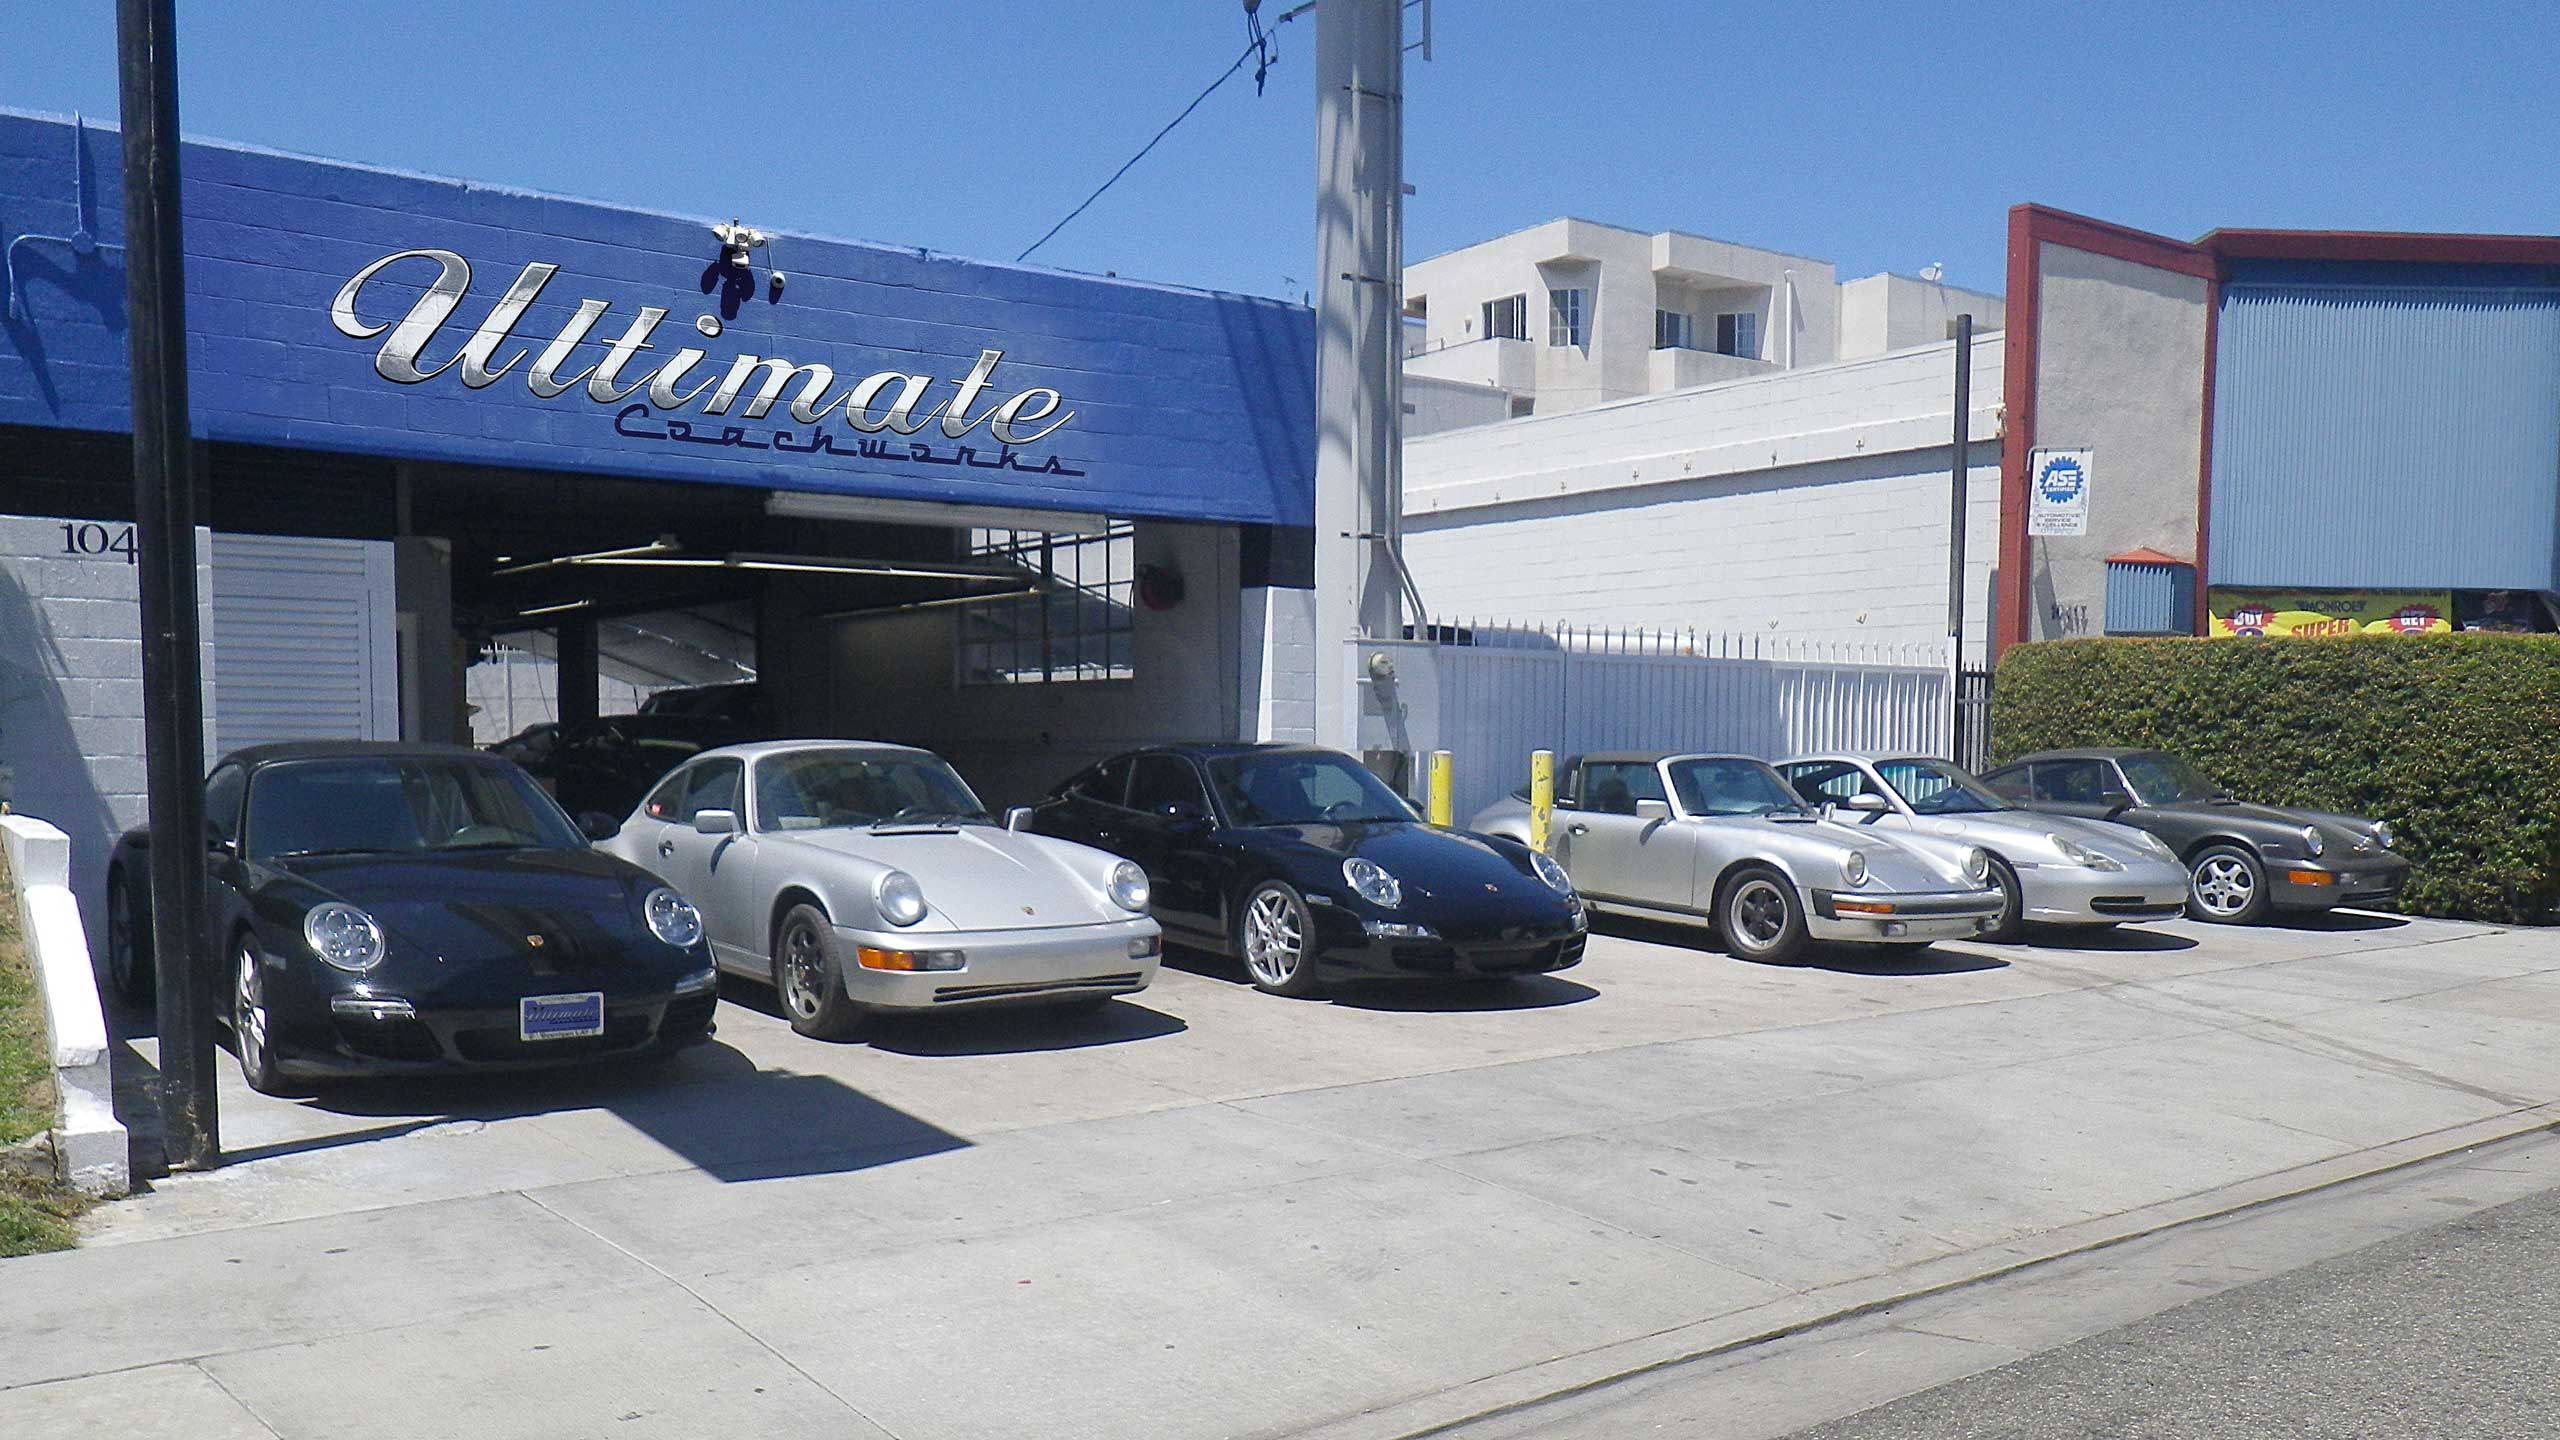 UC_6_car_side_storefront_2560x1440-001